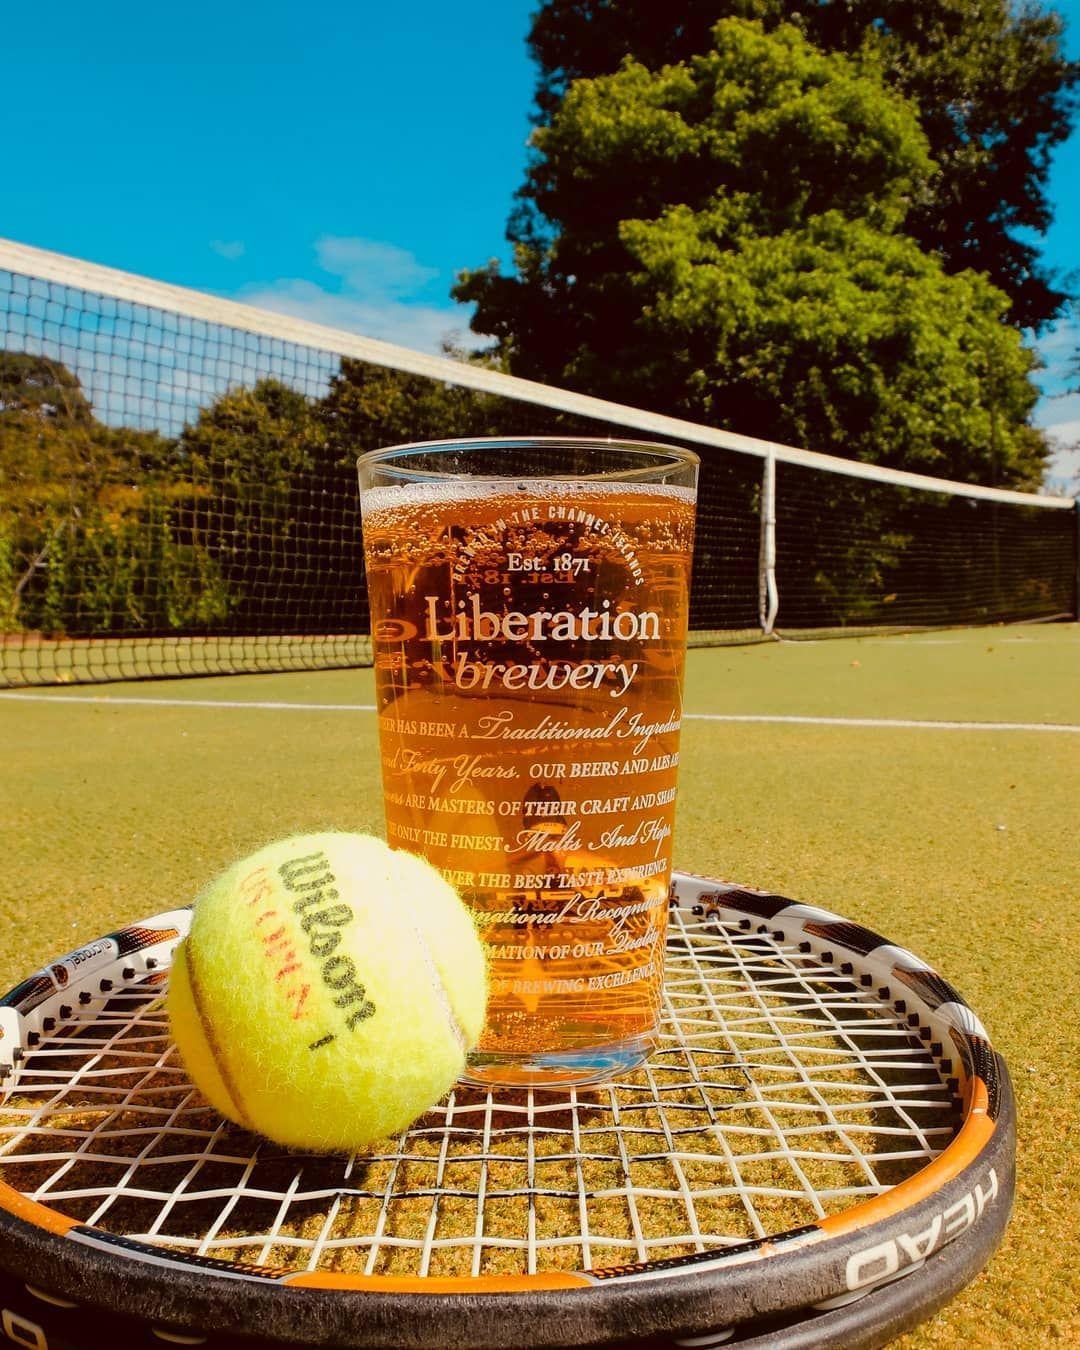 Roger and Serena played great games this afternoon and we love the #Wimbledon spirit this year      #wimbledon #federer #djokovic #tennis #nadal #beer #craftbeer #niketennis #tennisplayer #beerporn #instabeer #beerstagram #beergeek #tenniscourt #bier #wilson #tennisball #beertography #serenawilliams